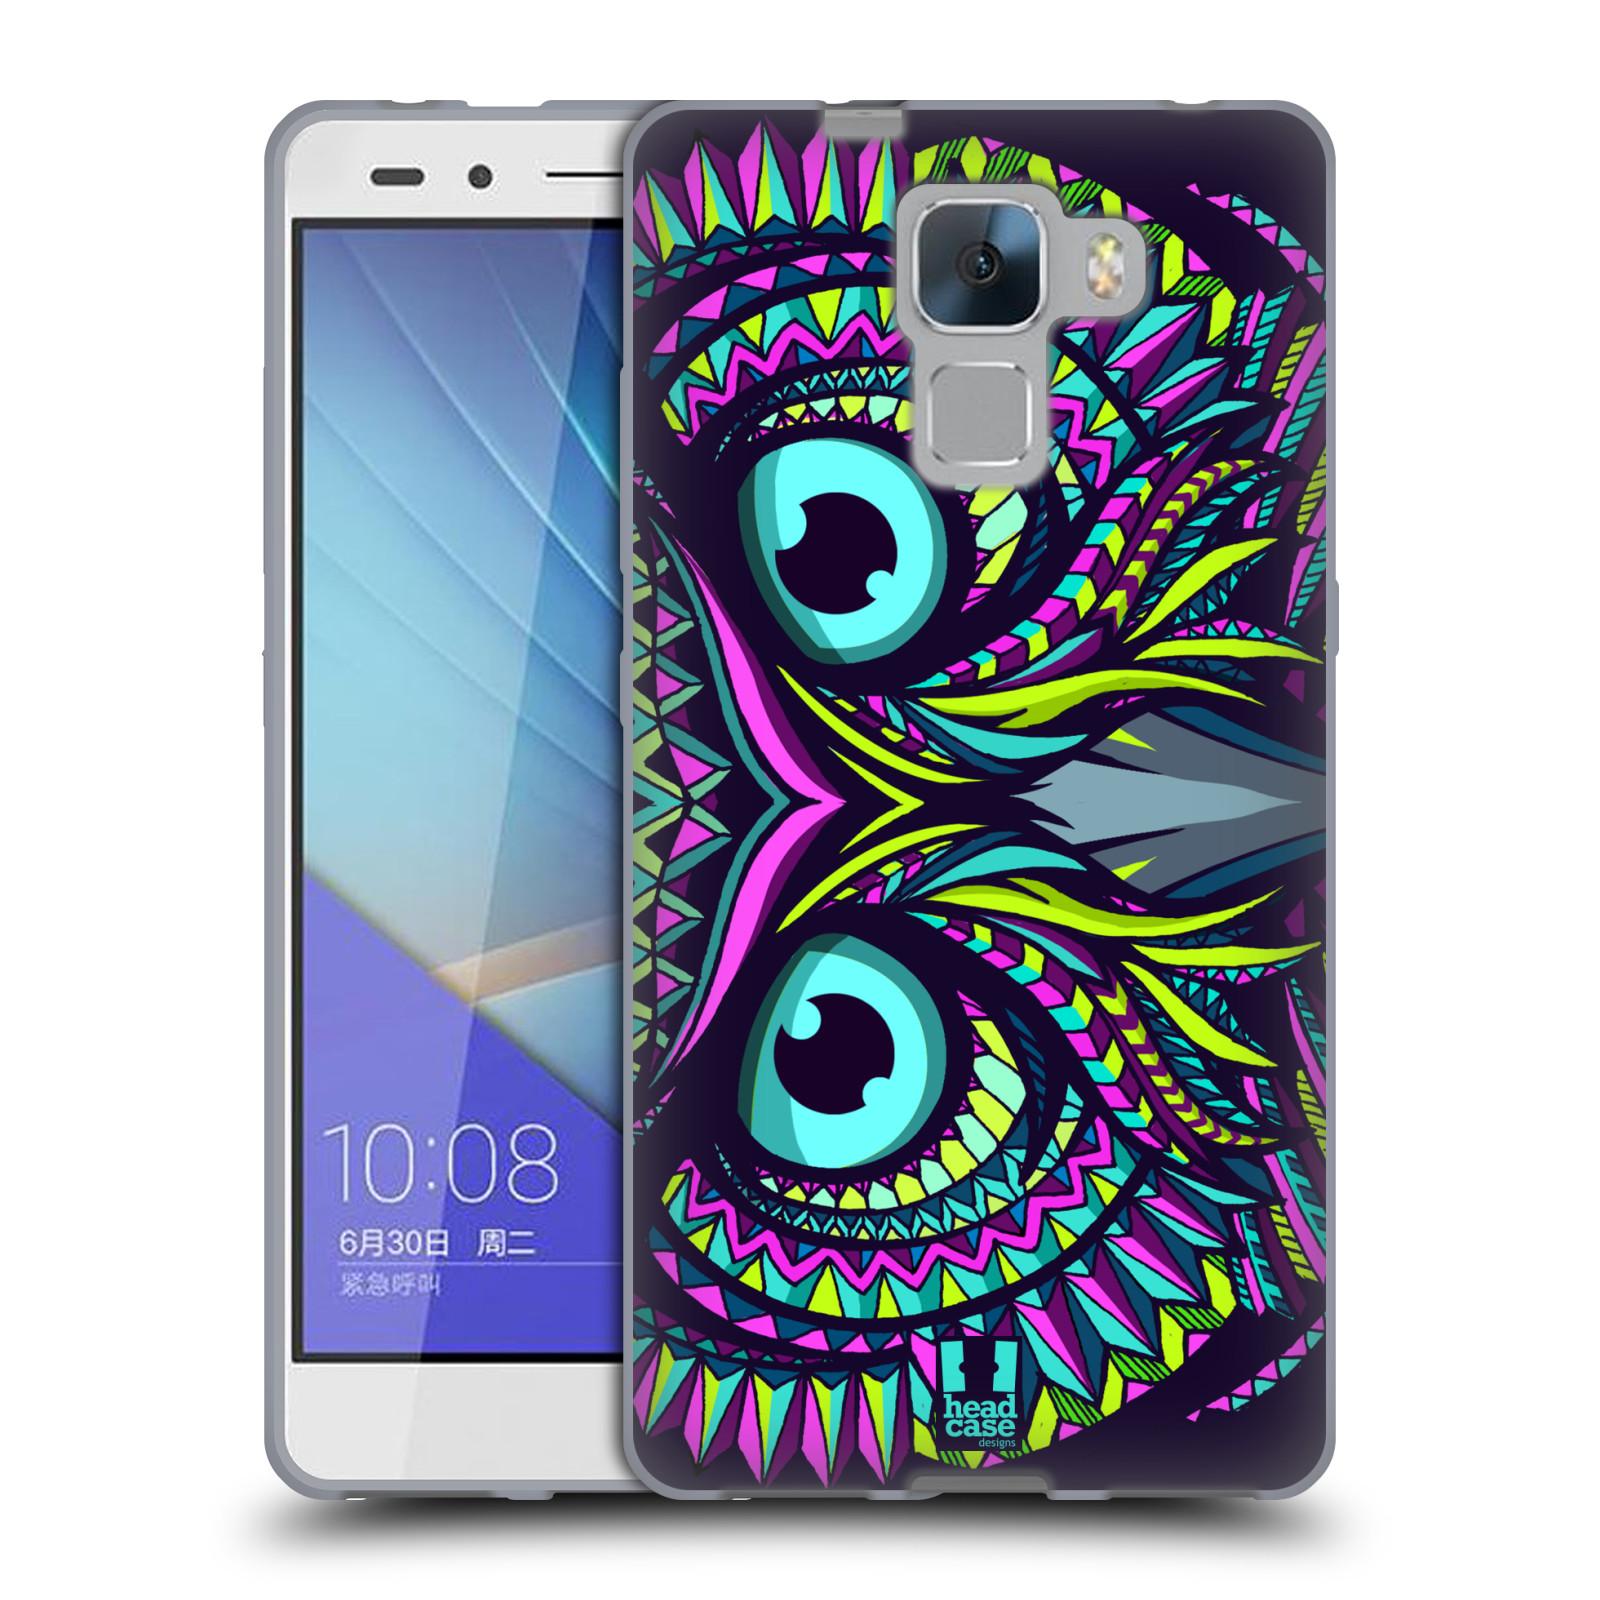 Silikonové pouzdro na mobil Honor 7 HEAD CASE AZTEC SOVA